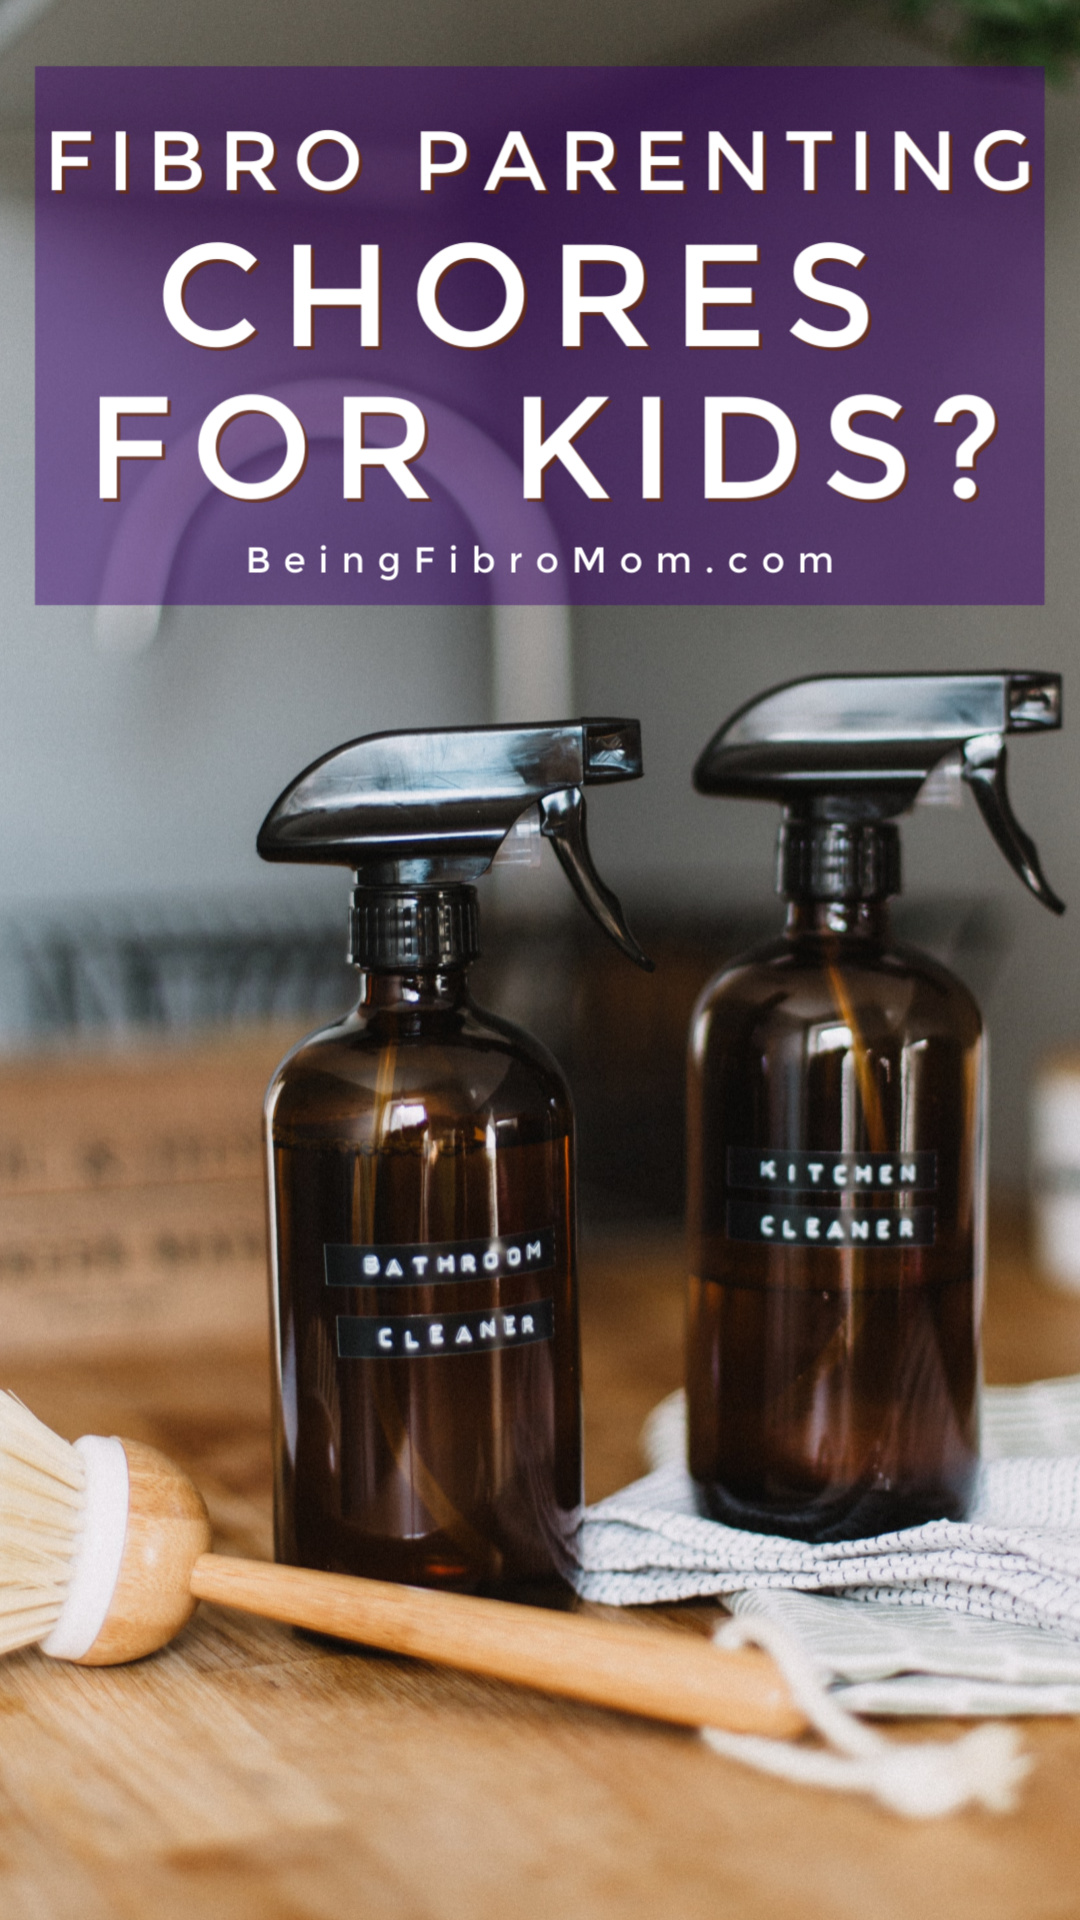 Fibro Parenting: Chores for Kids? #beingfibromom #fibroparenting #fibromyalgia #chores